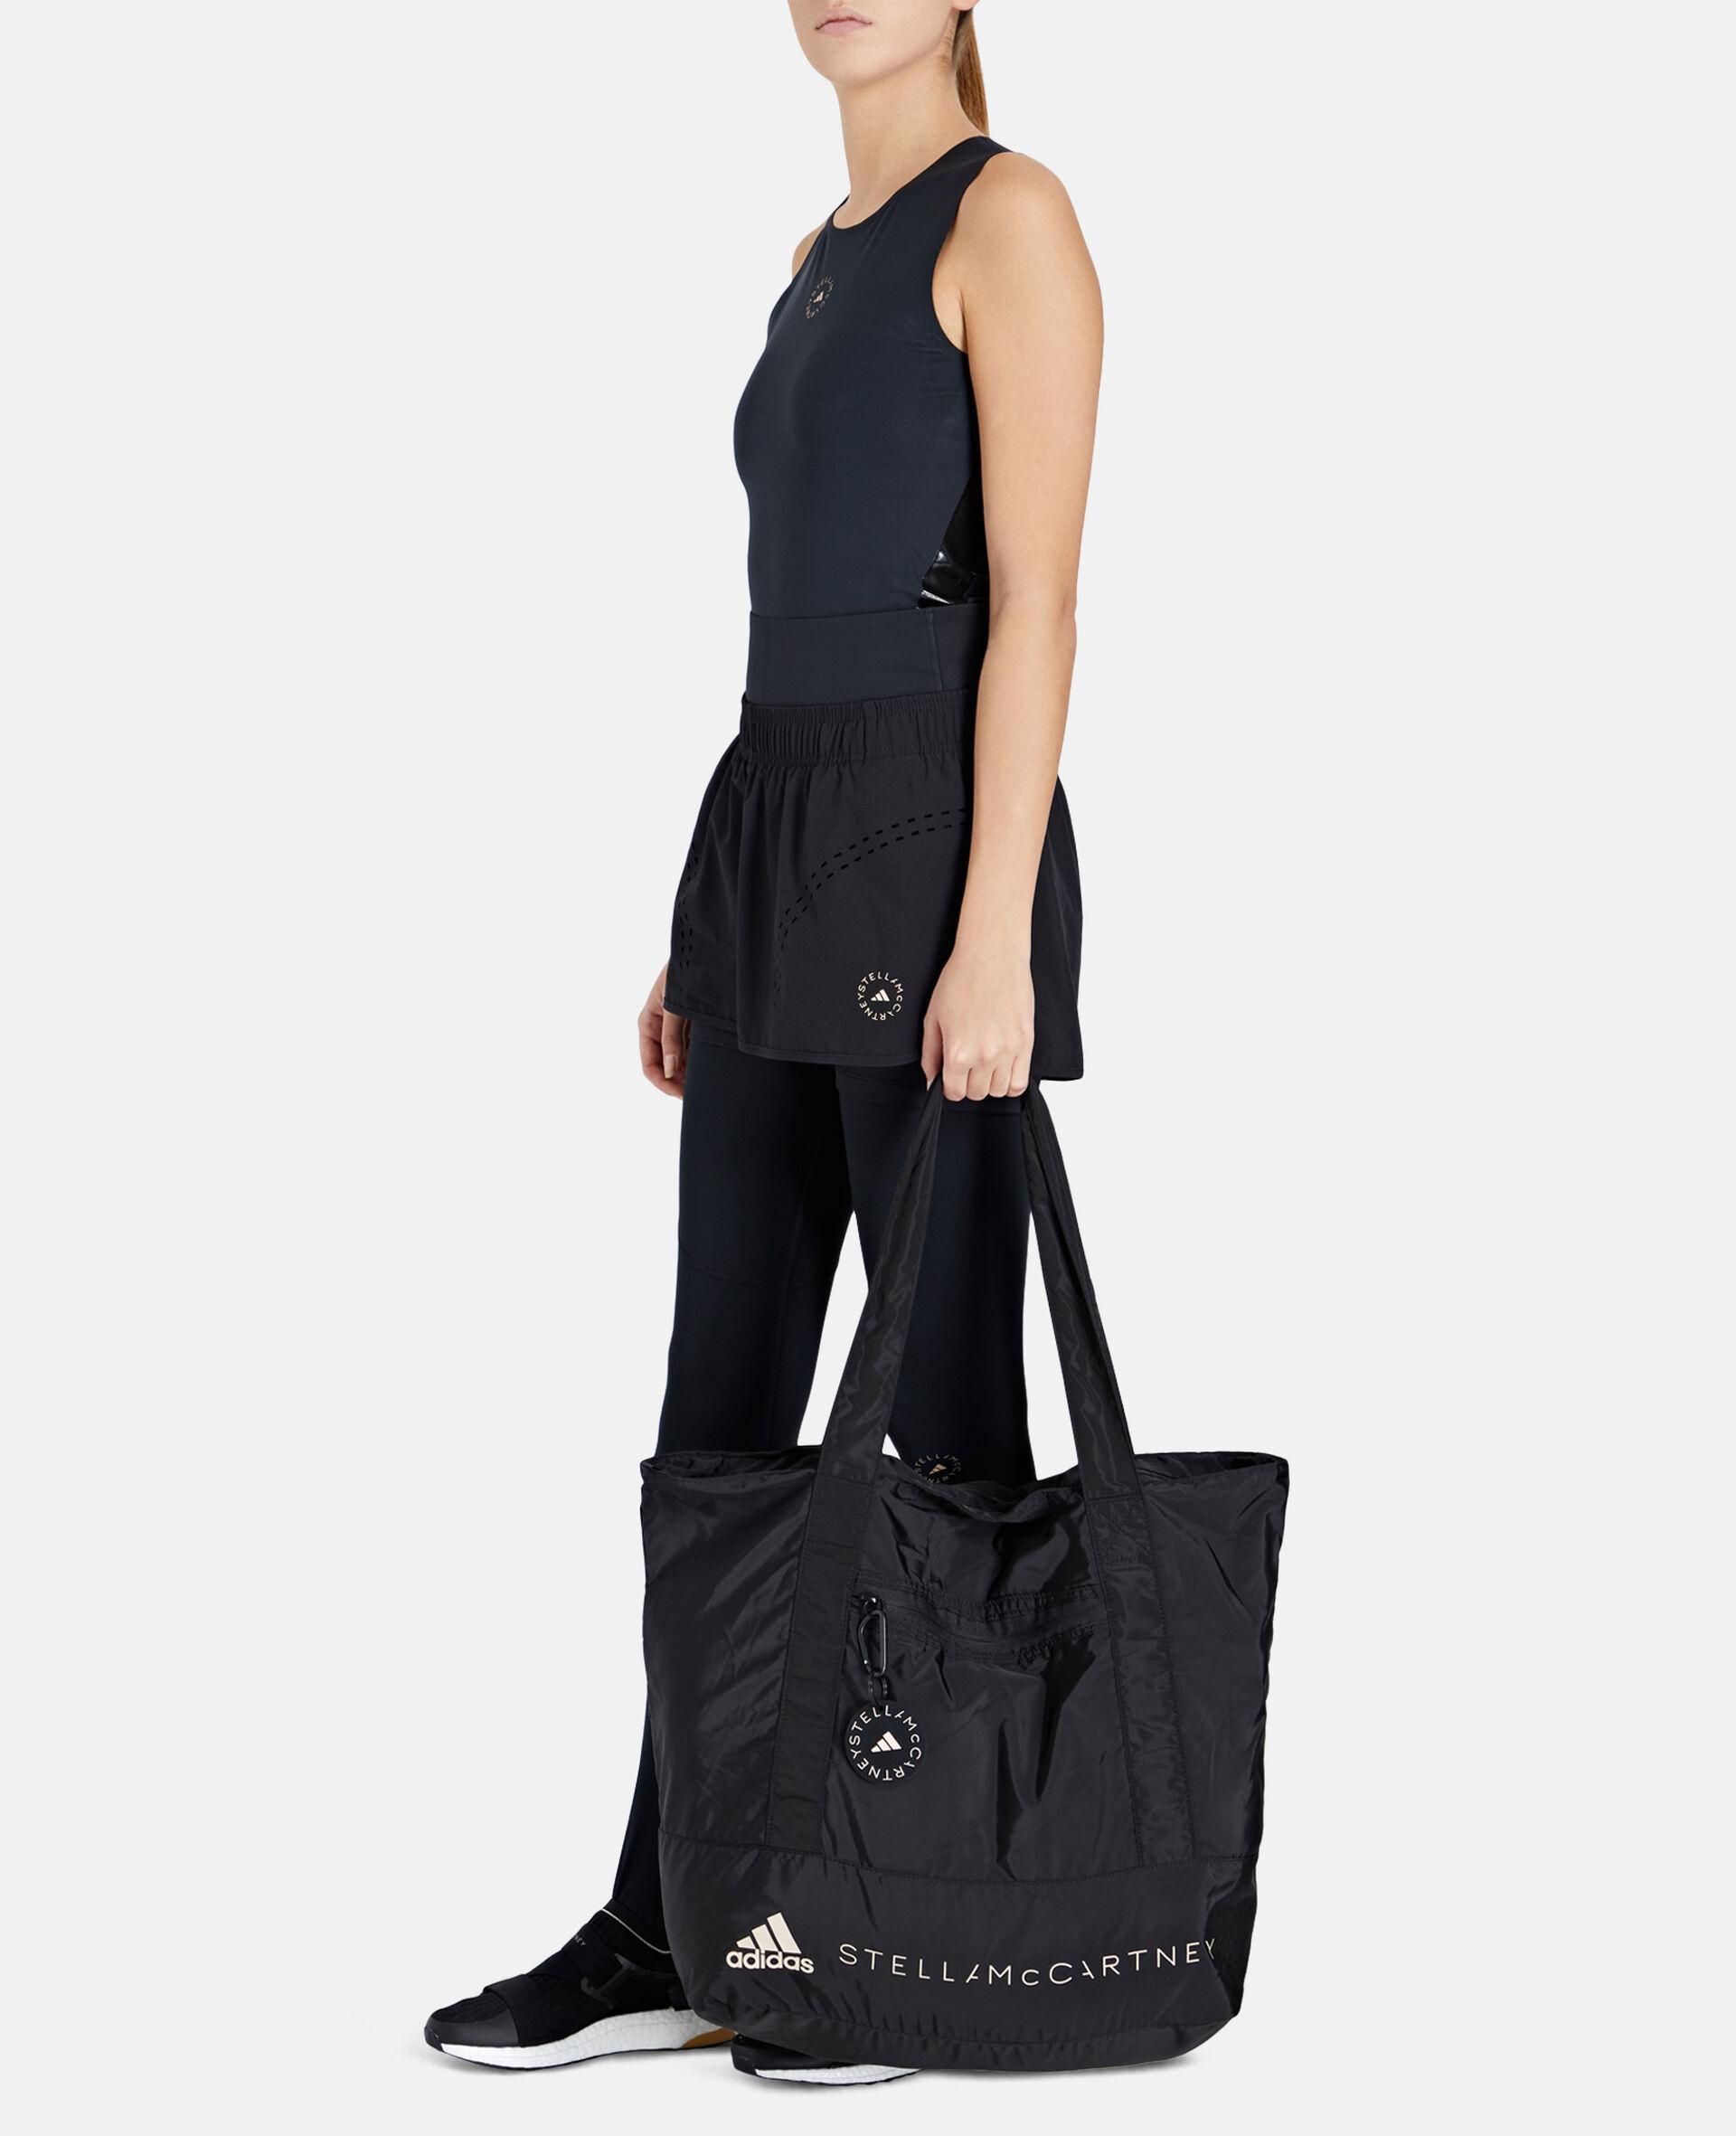 Black Printed Tote Bag -Black-large image number 3